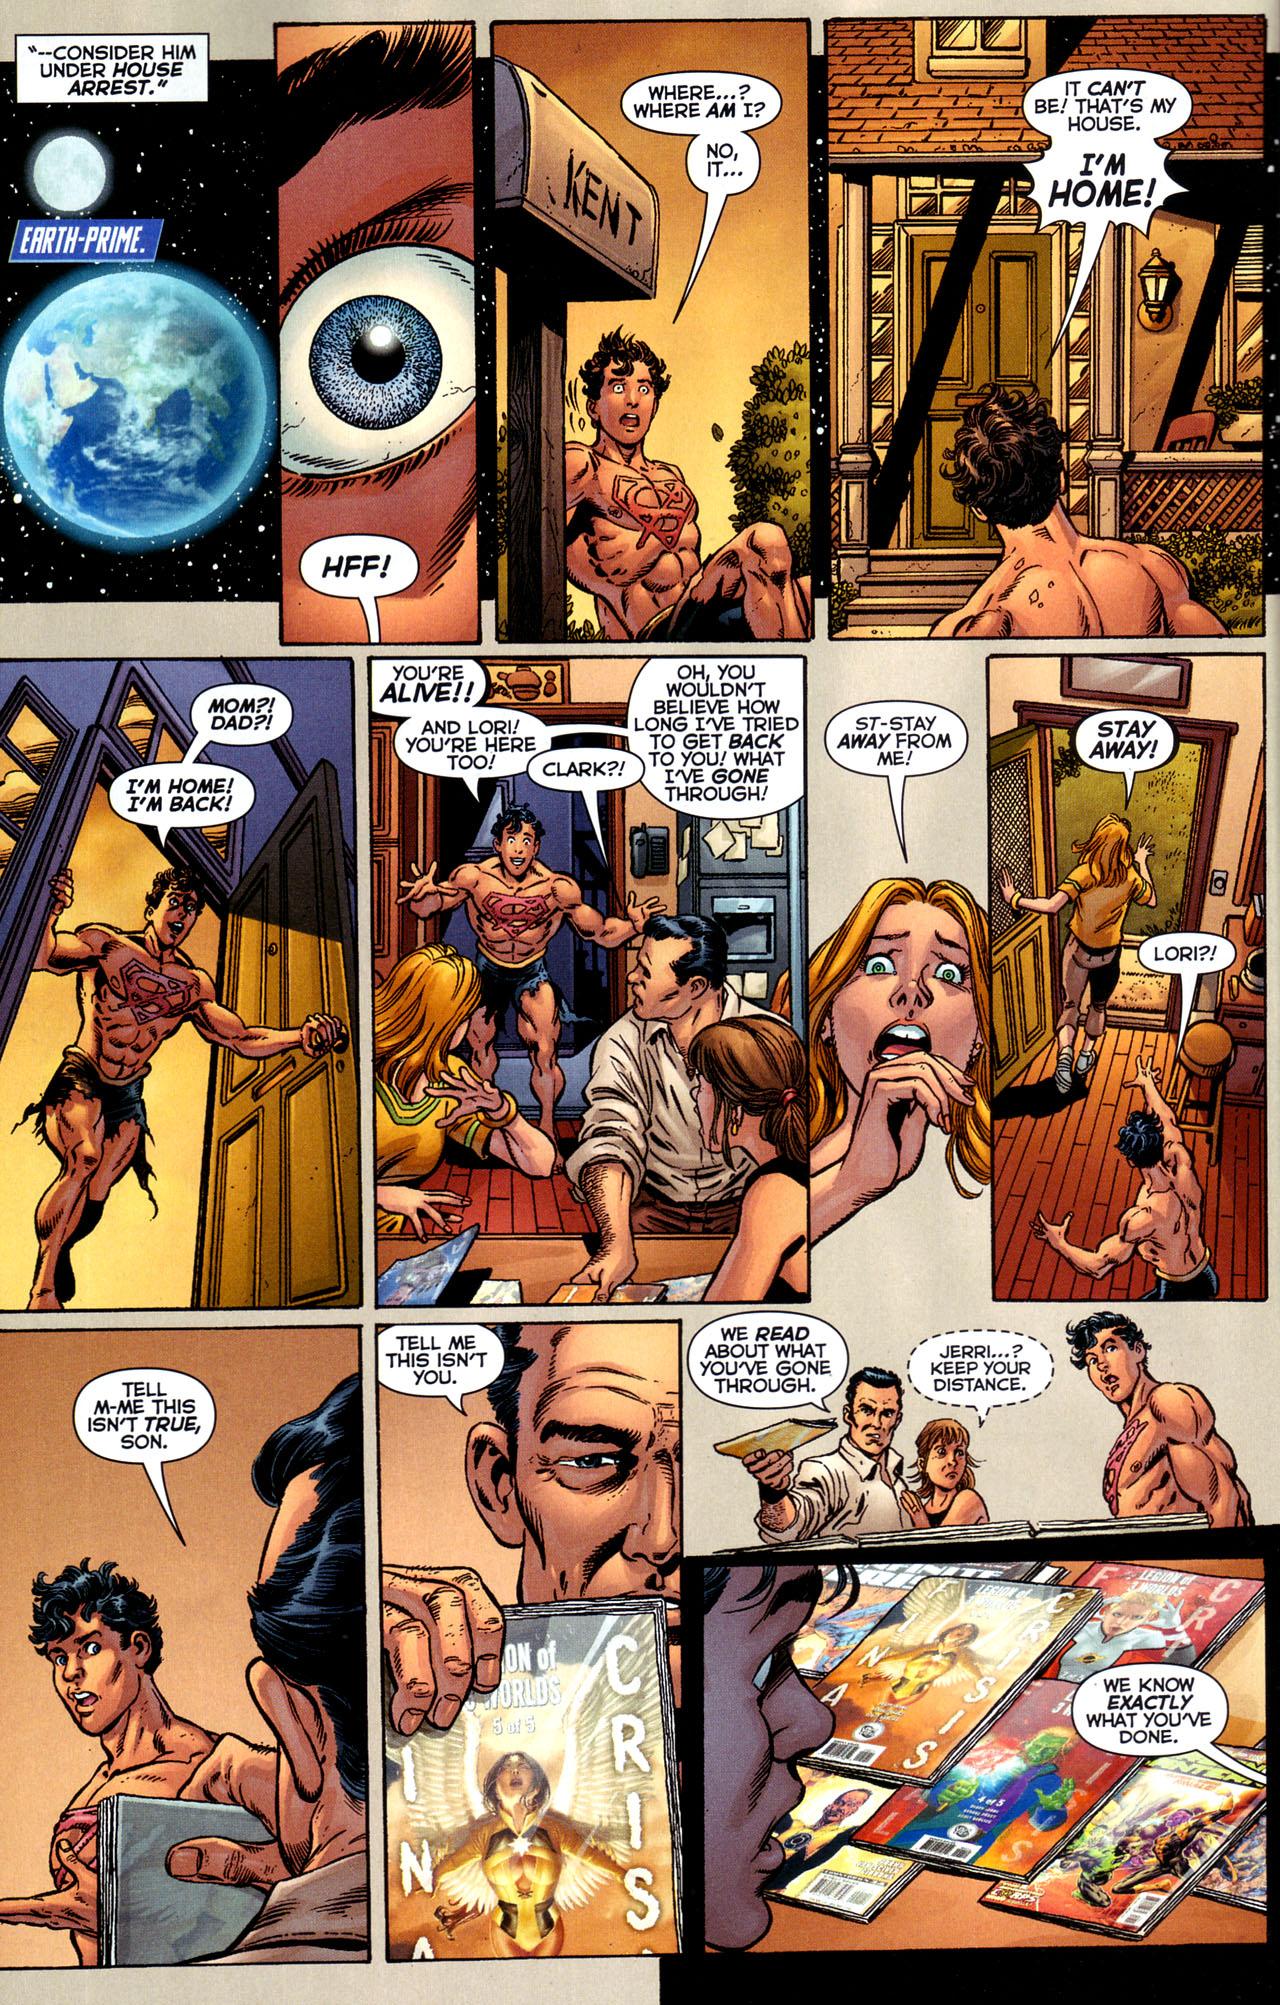 Superboy Prime Returns to Earth Prime patricia zentilli zentilli patricia patricia zentilli zentilli patricia ...